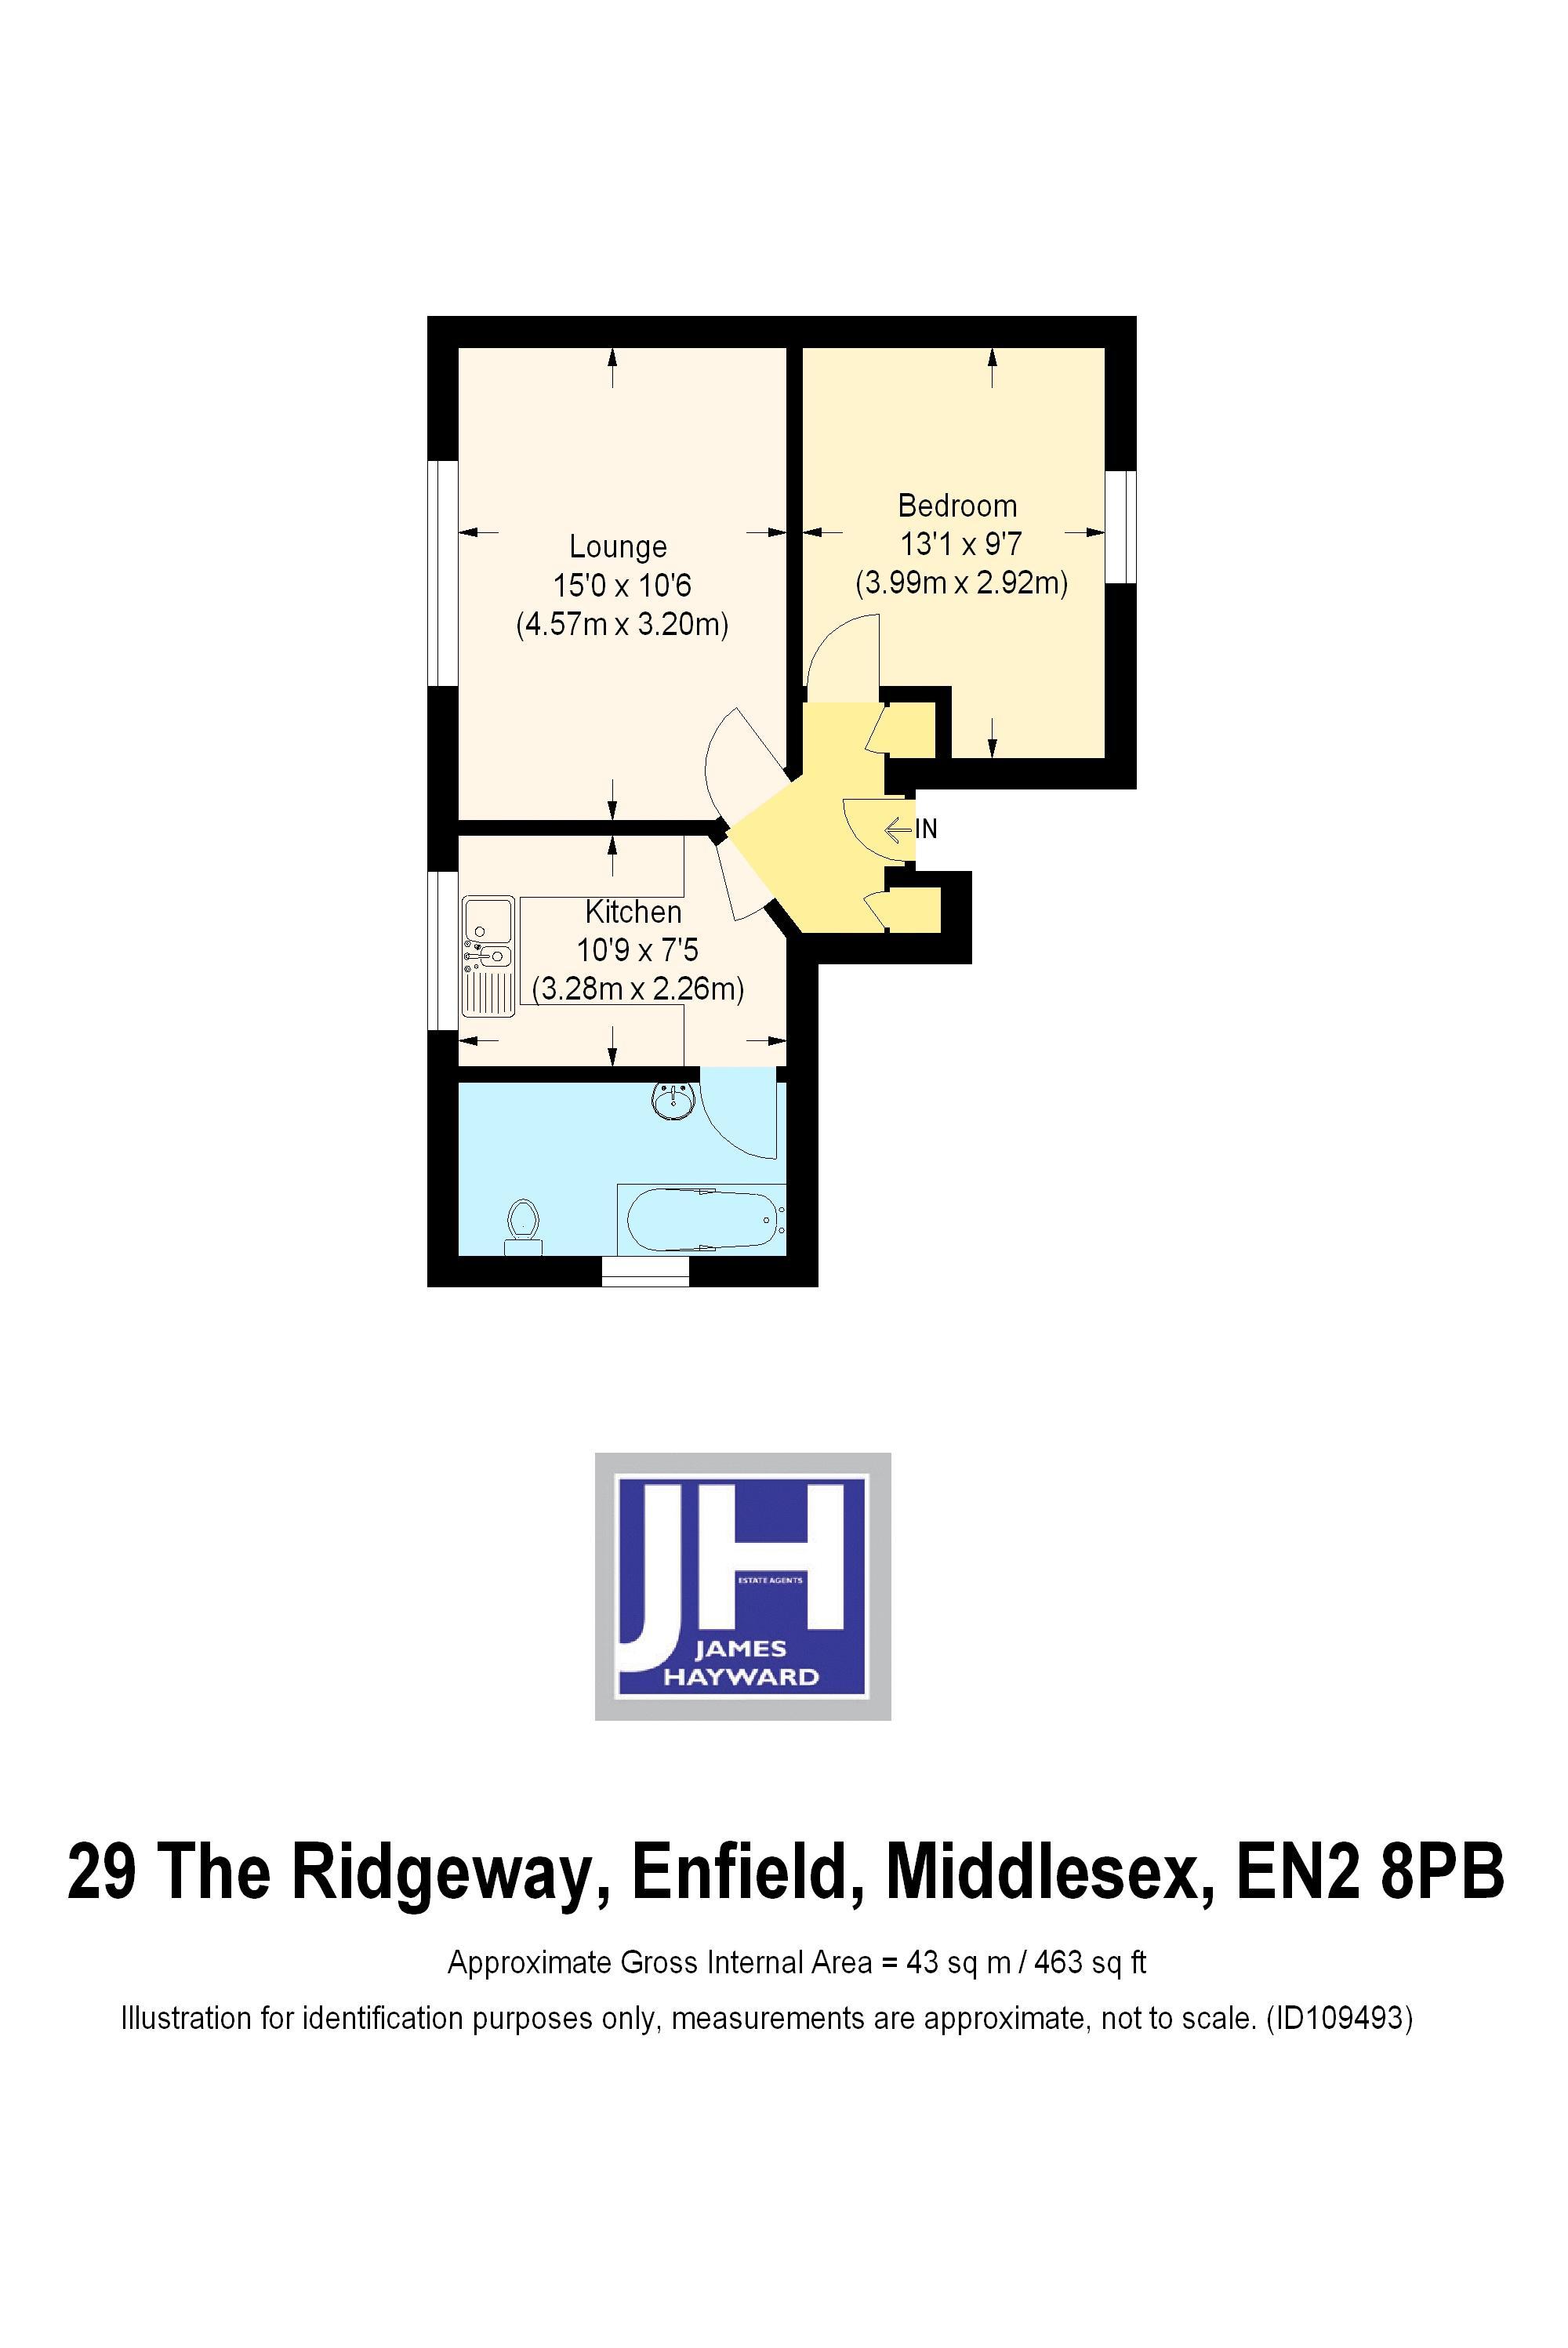 29, The Ridgeway